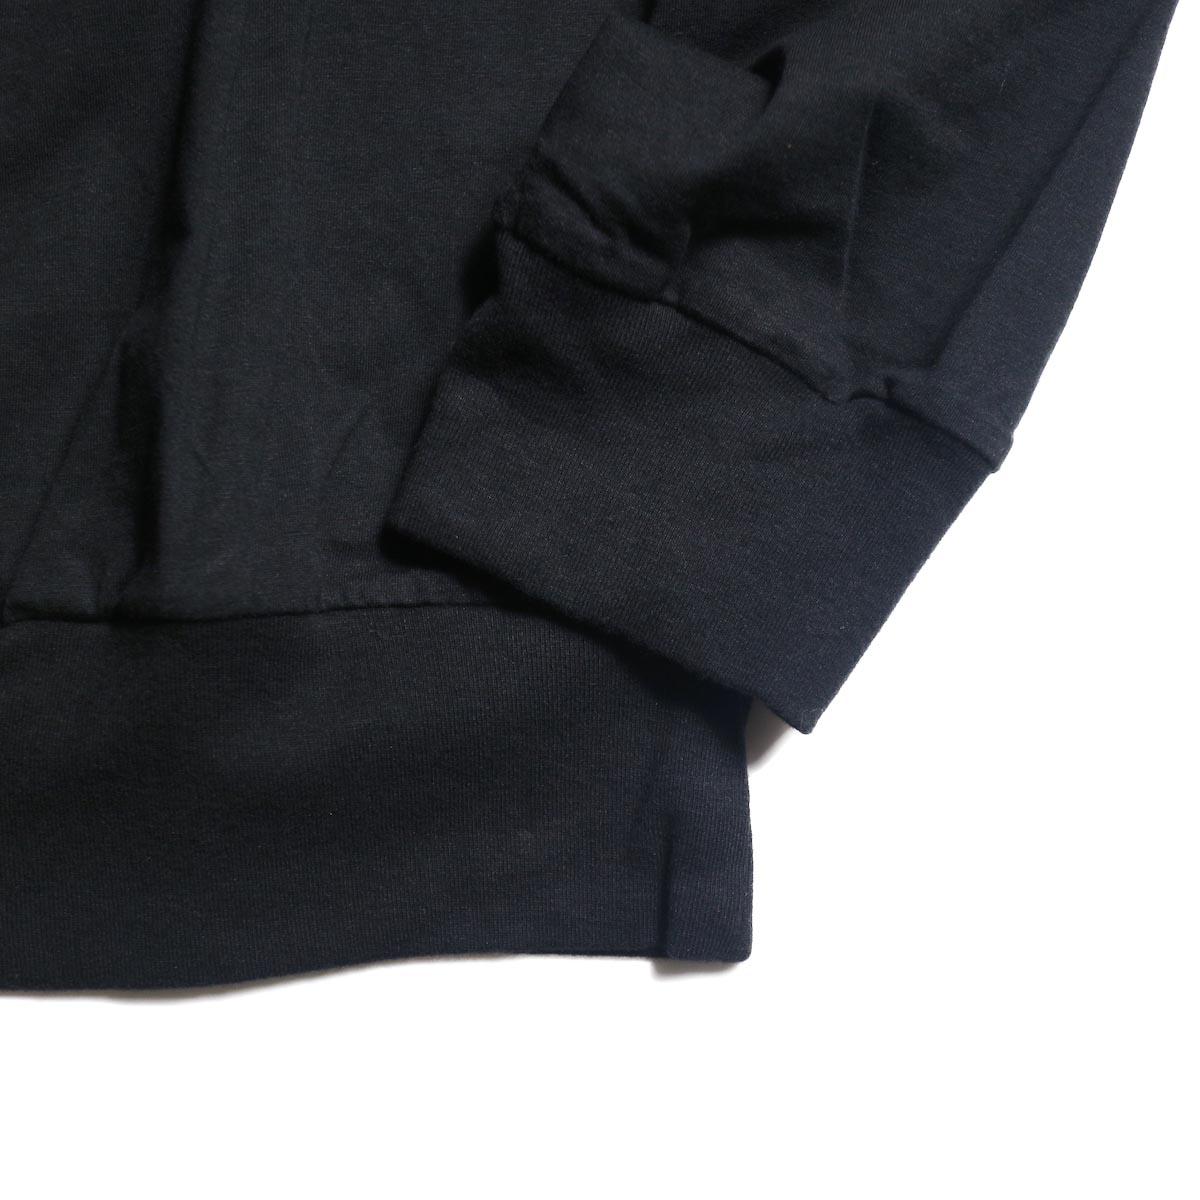 blurhms / Silk Cotton Jersey L/S P/O Loose Fit (Black)袖、裾